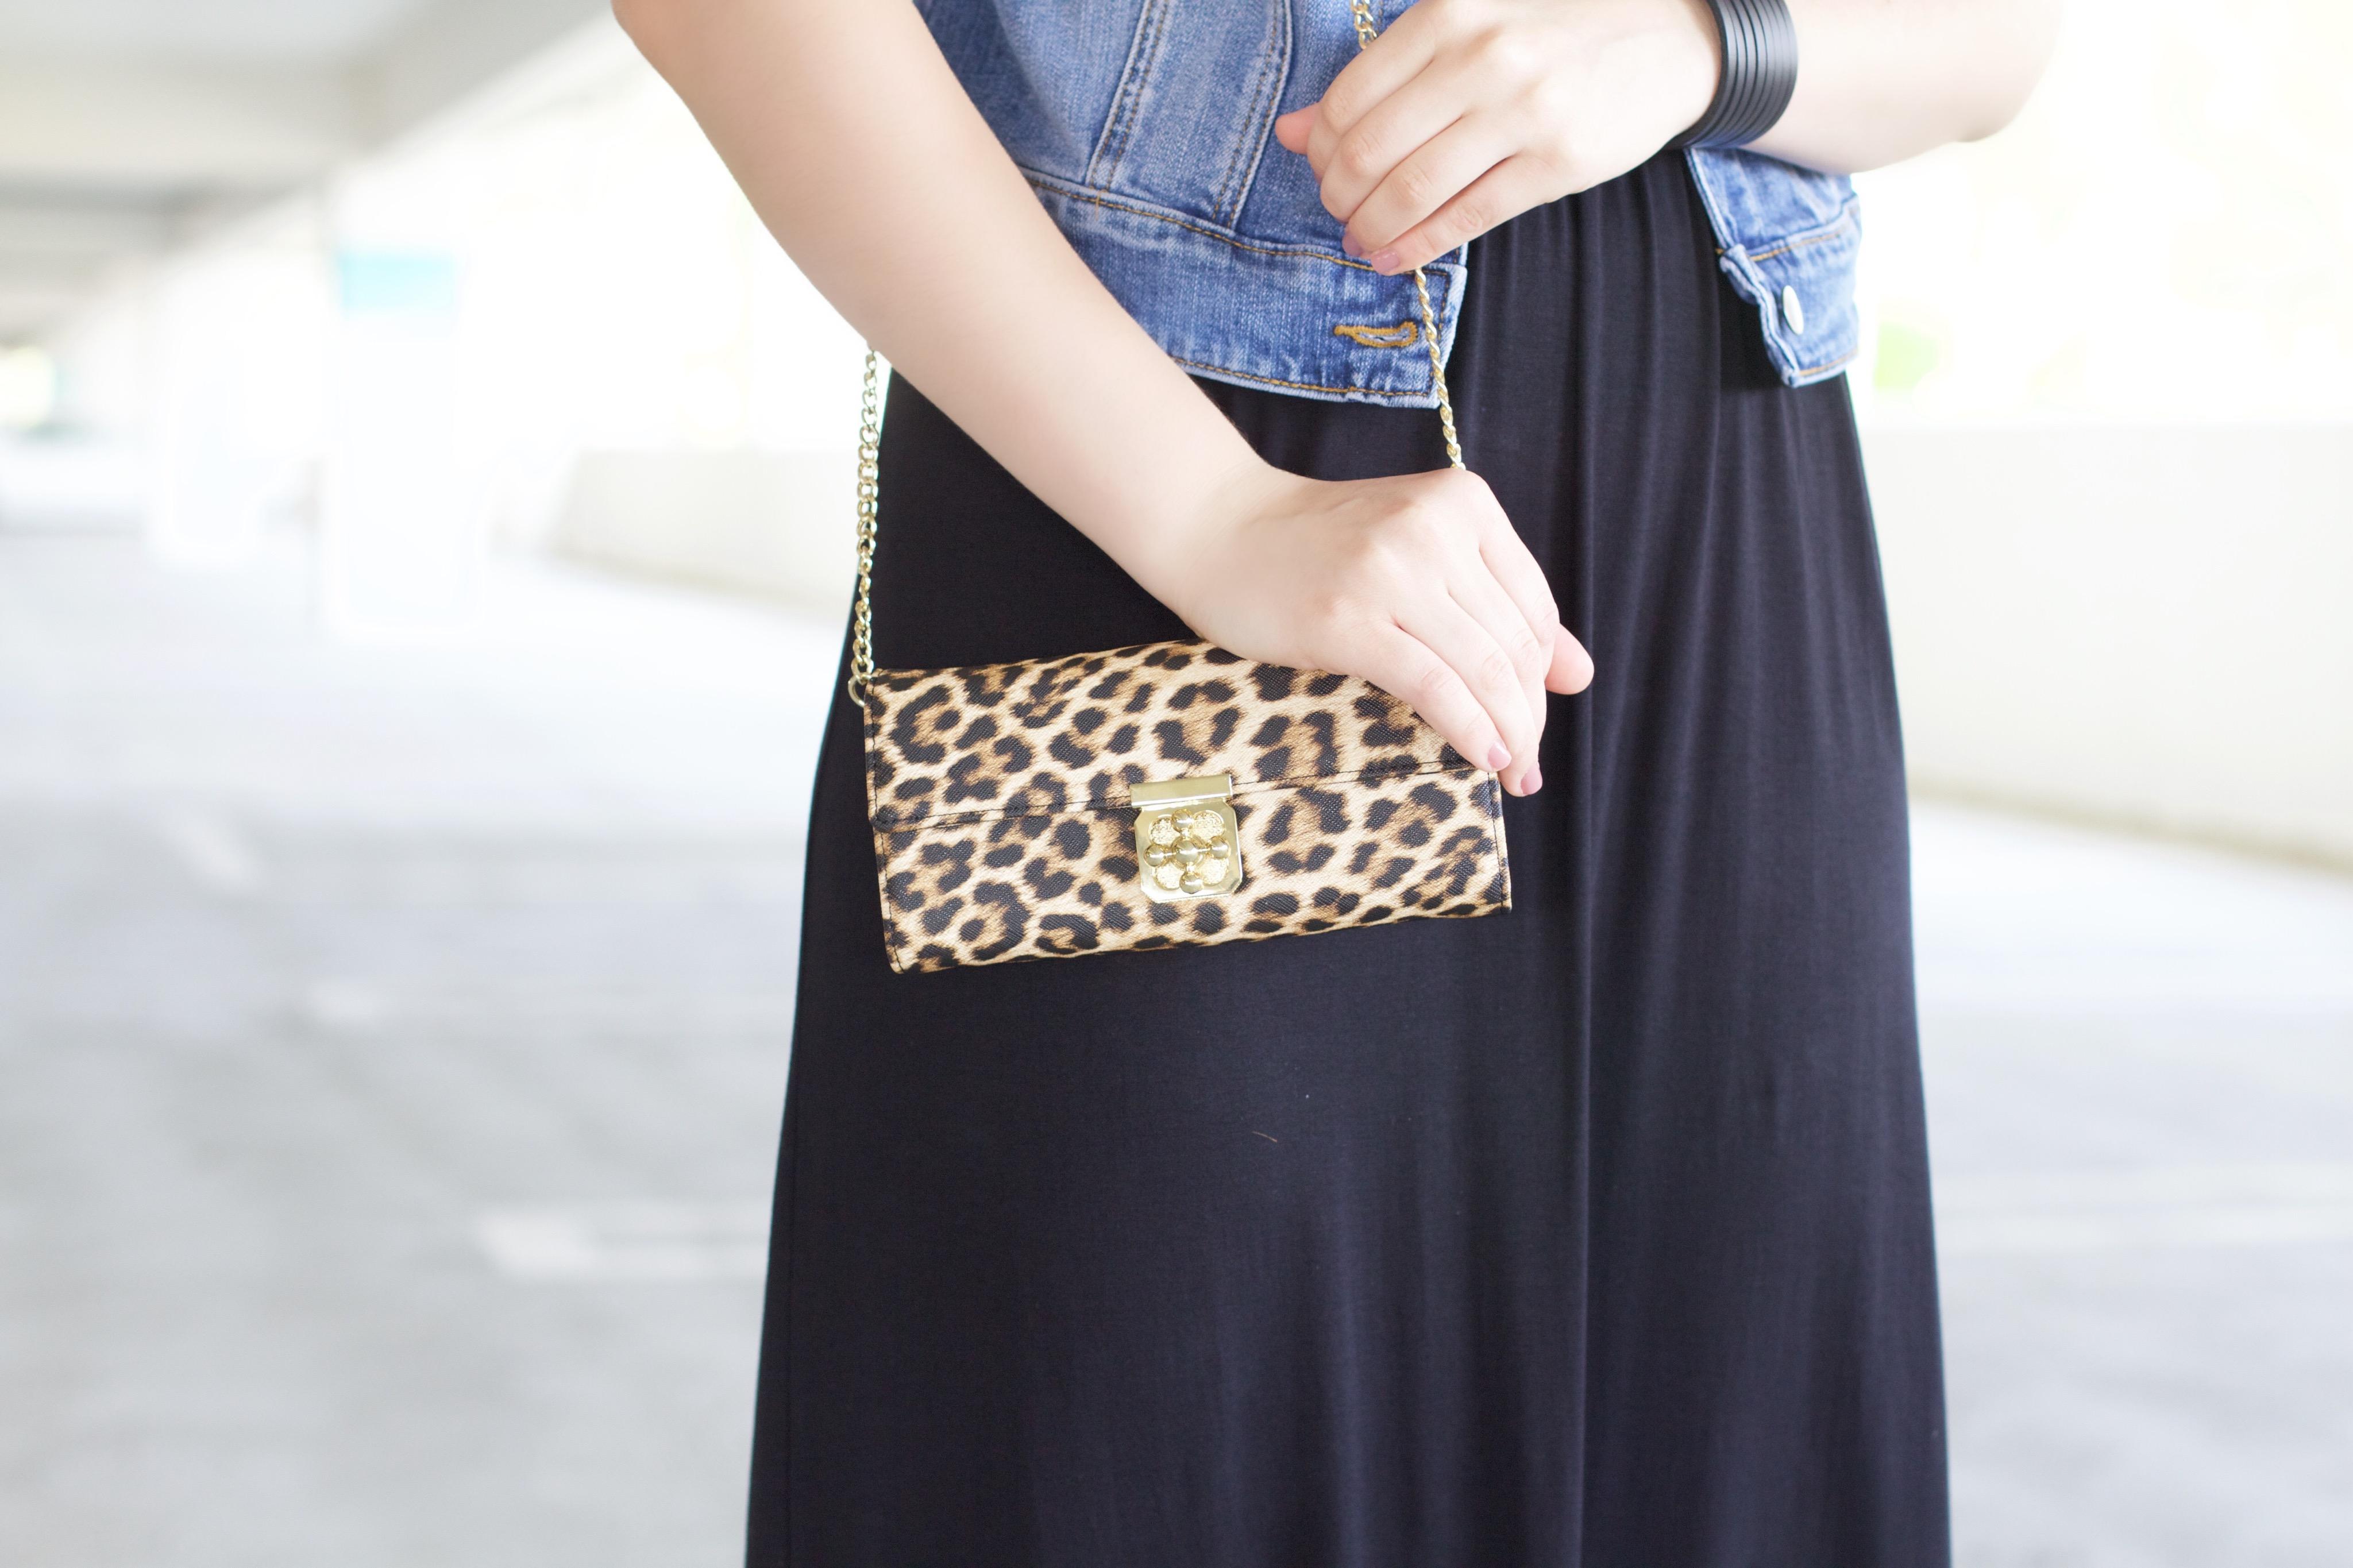 Leopard Crossbody Clutch - My Styled Life